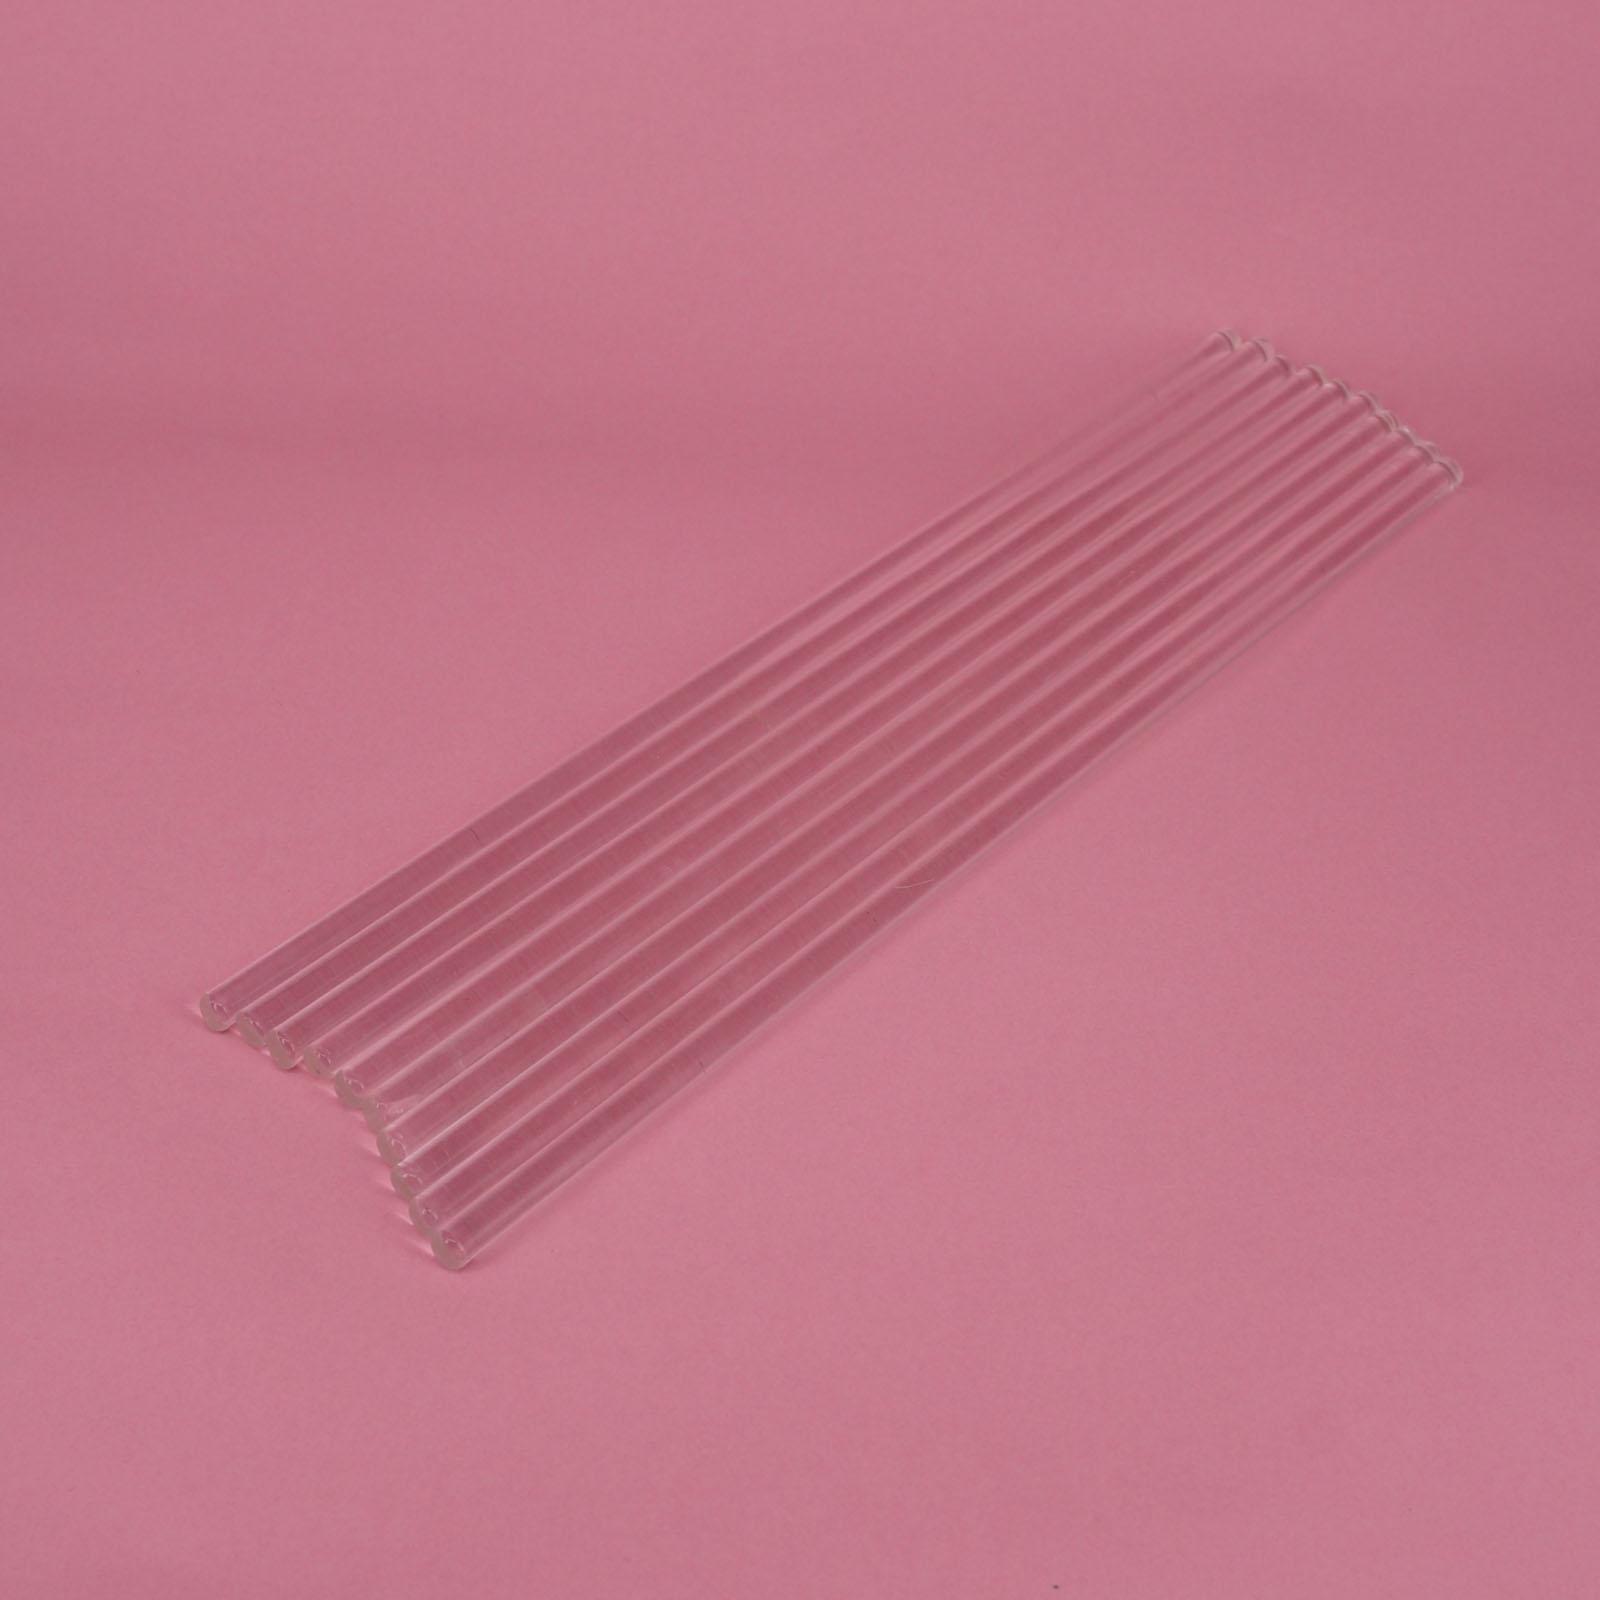 LOT10 6x250mm Lab Glass Stirring Rods Borosilicate High Resistant Stirrer